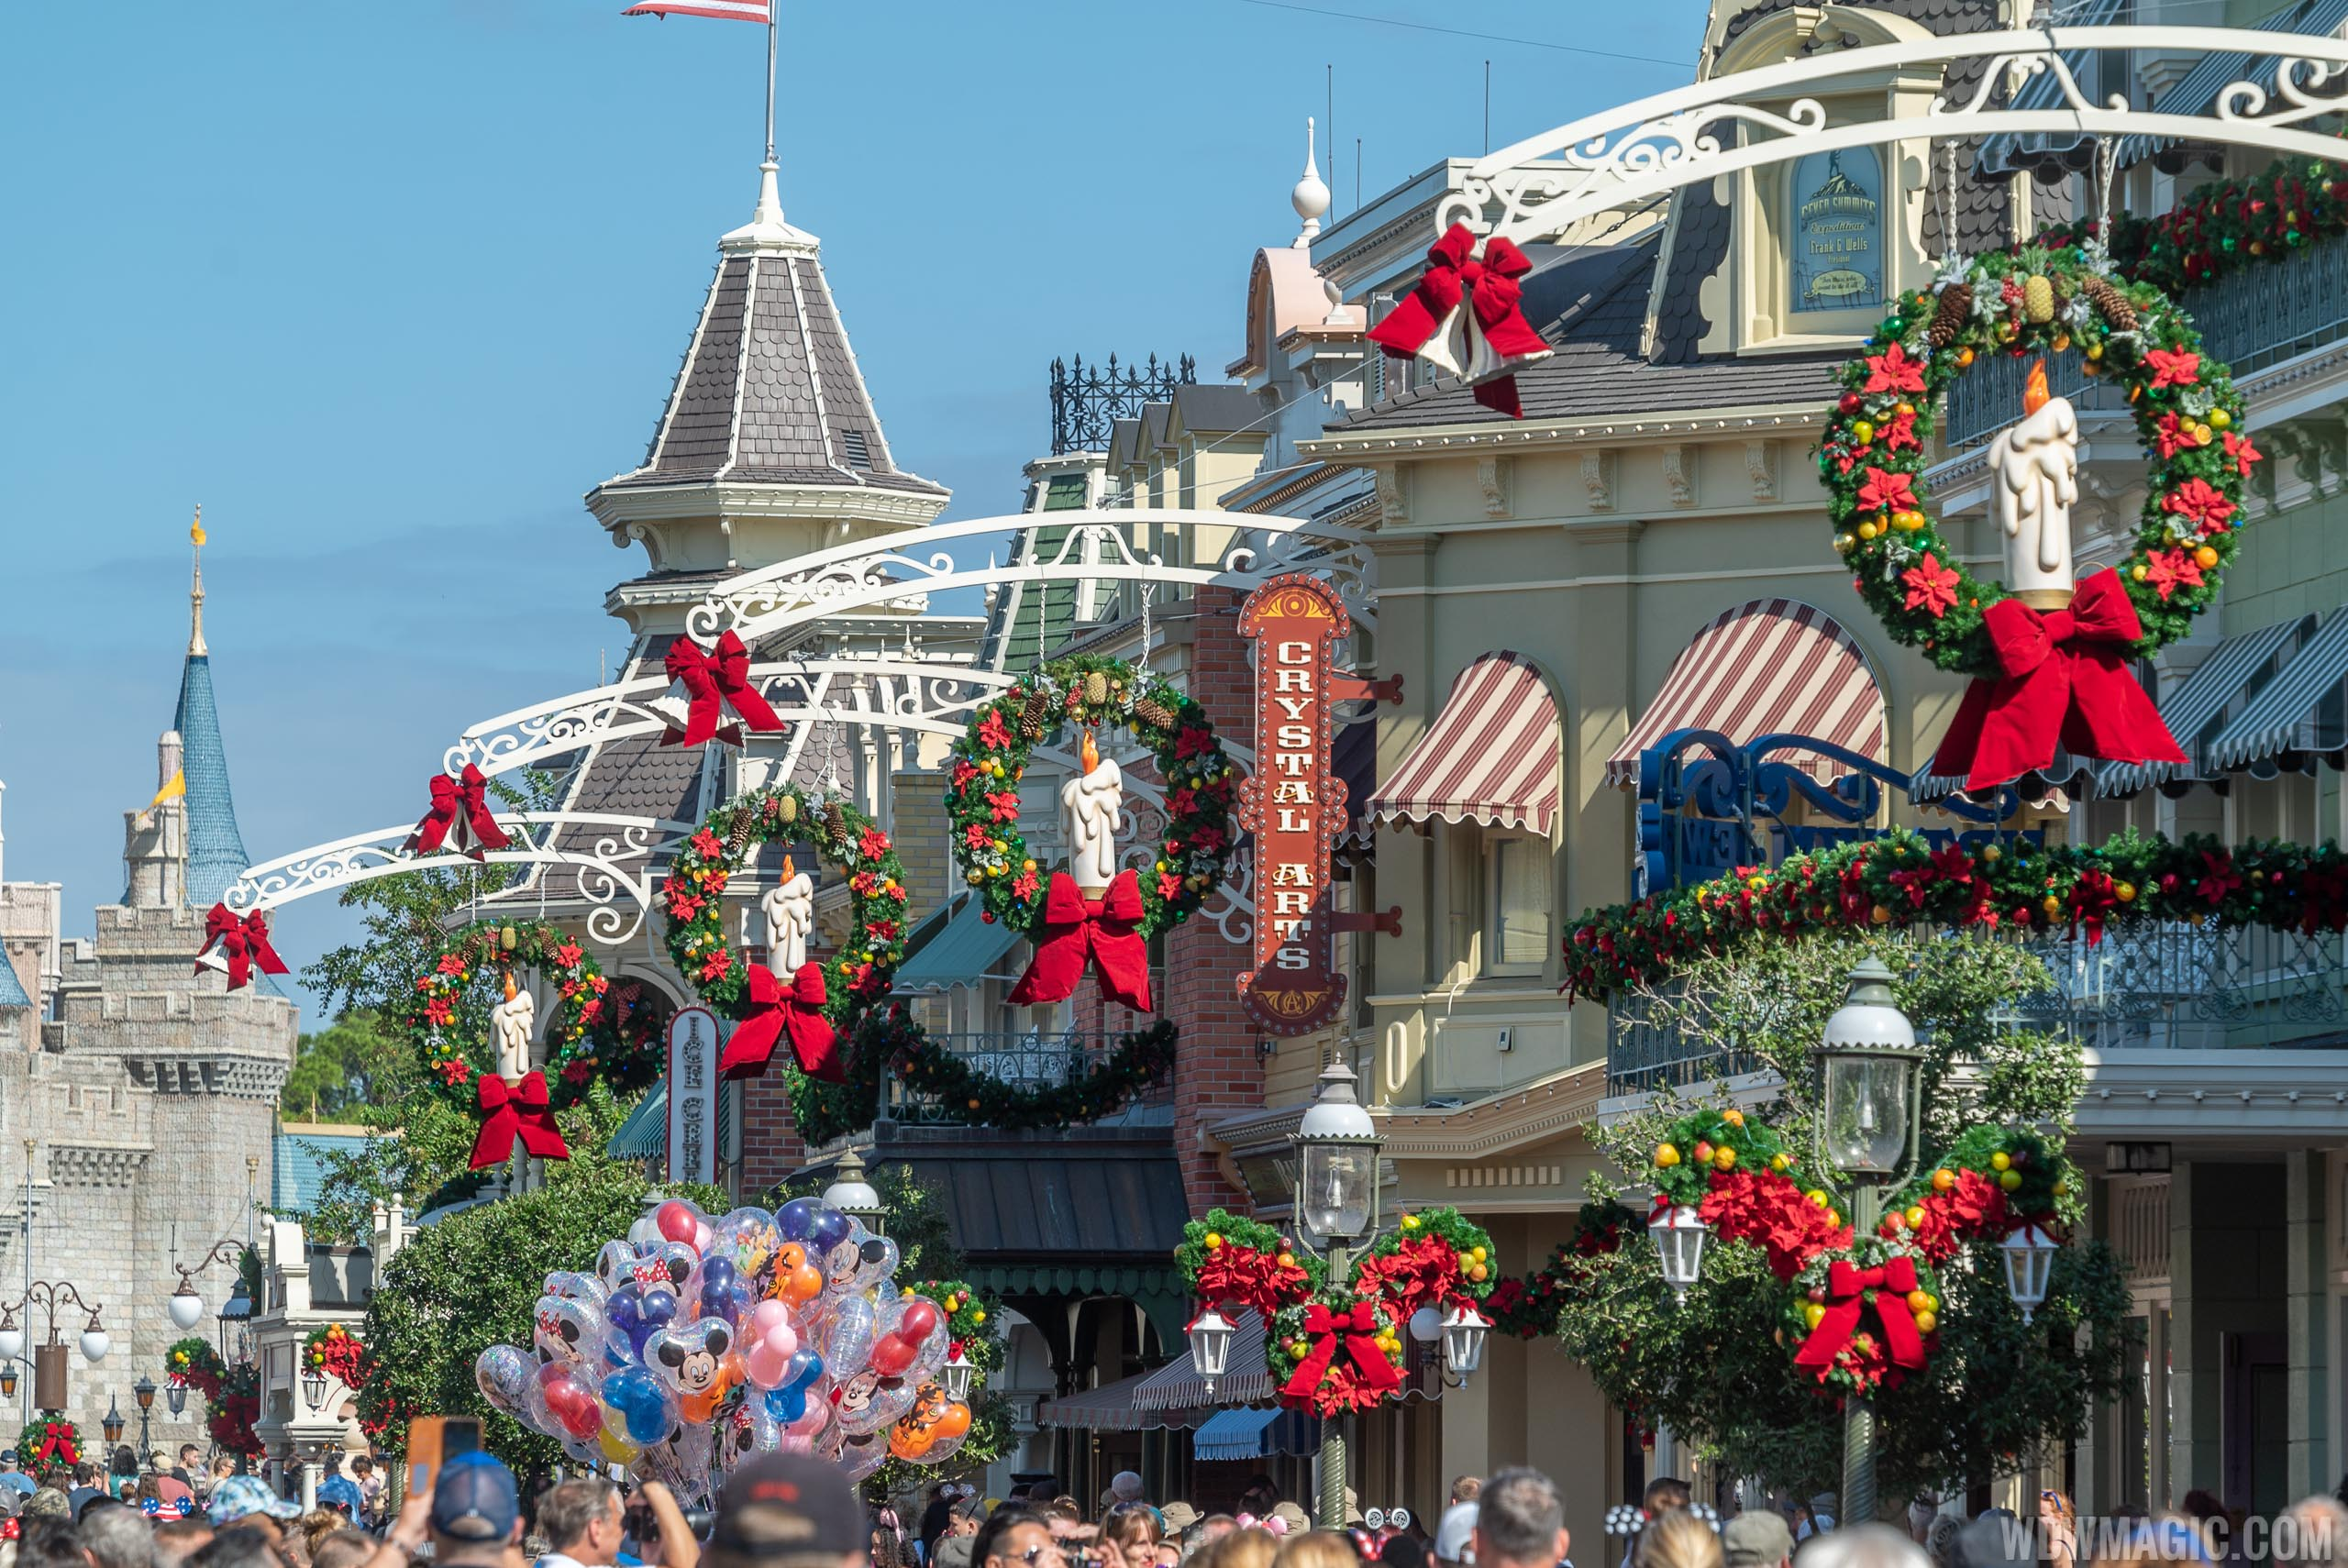 Christmas Holidays decorations at the Magic Kingdom 2019